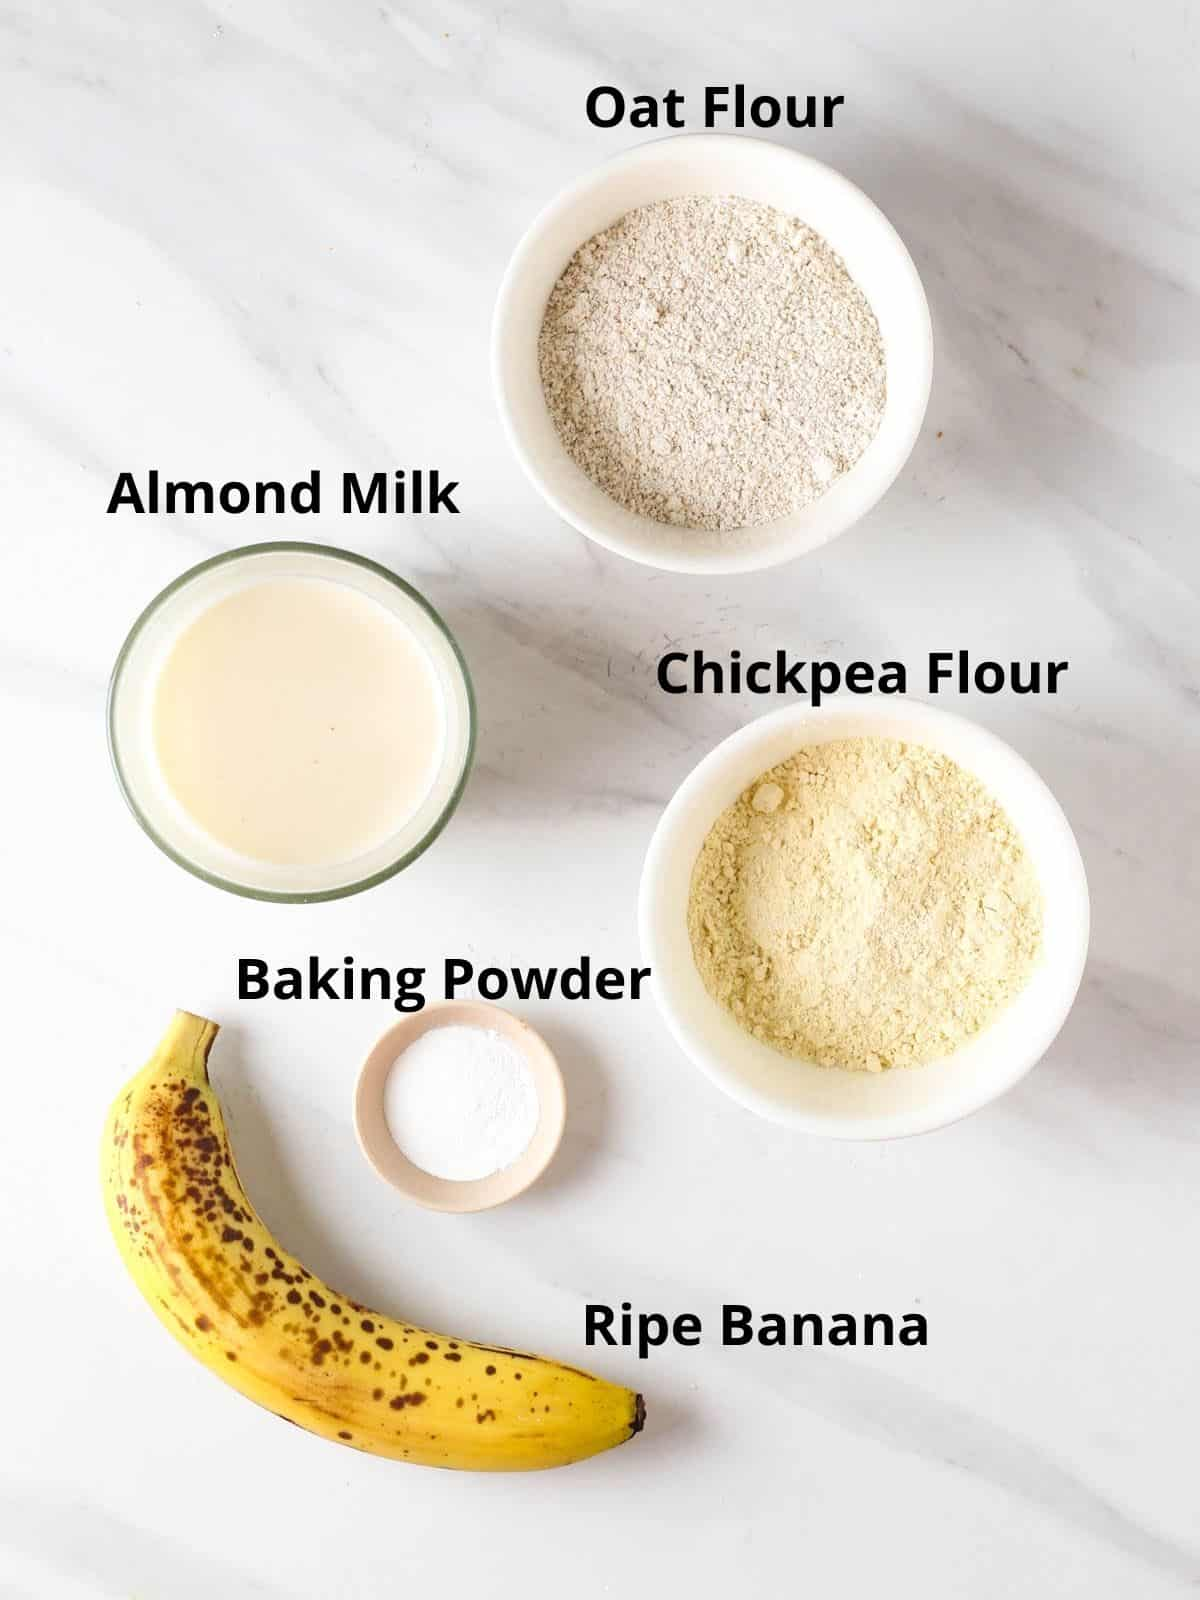 Ingredients needed like oat flour, chickpea flour, almond milk, baking powder and banana.